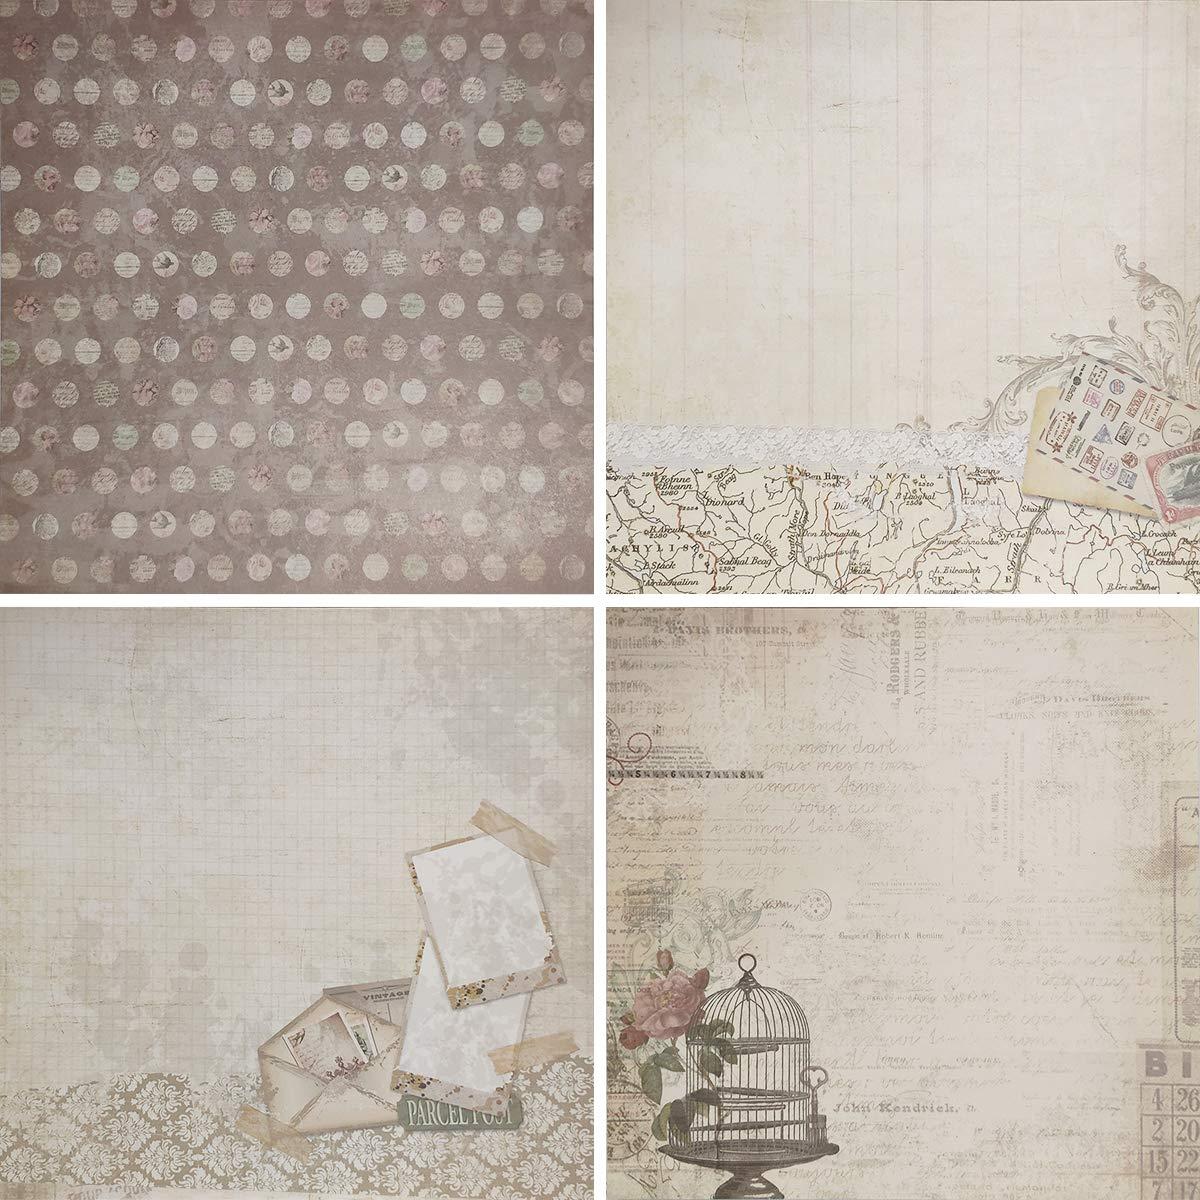 40 Sheets) levylisa 8x8 Cardstock Paper Pad Designer Paper Pad Floral Scrapbook Paper Decorative Craft Paper 007